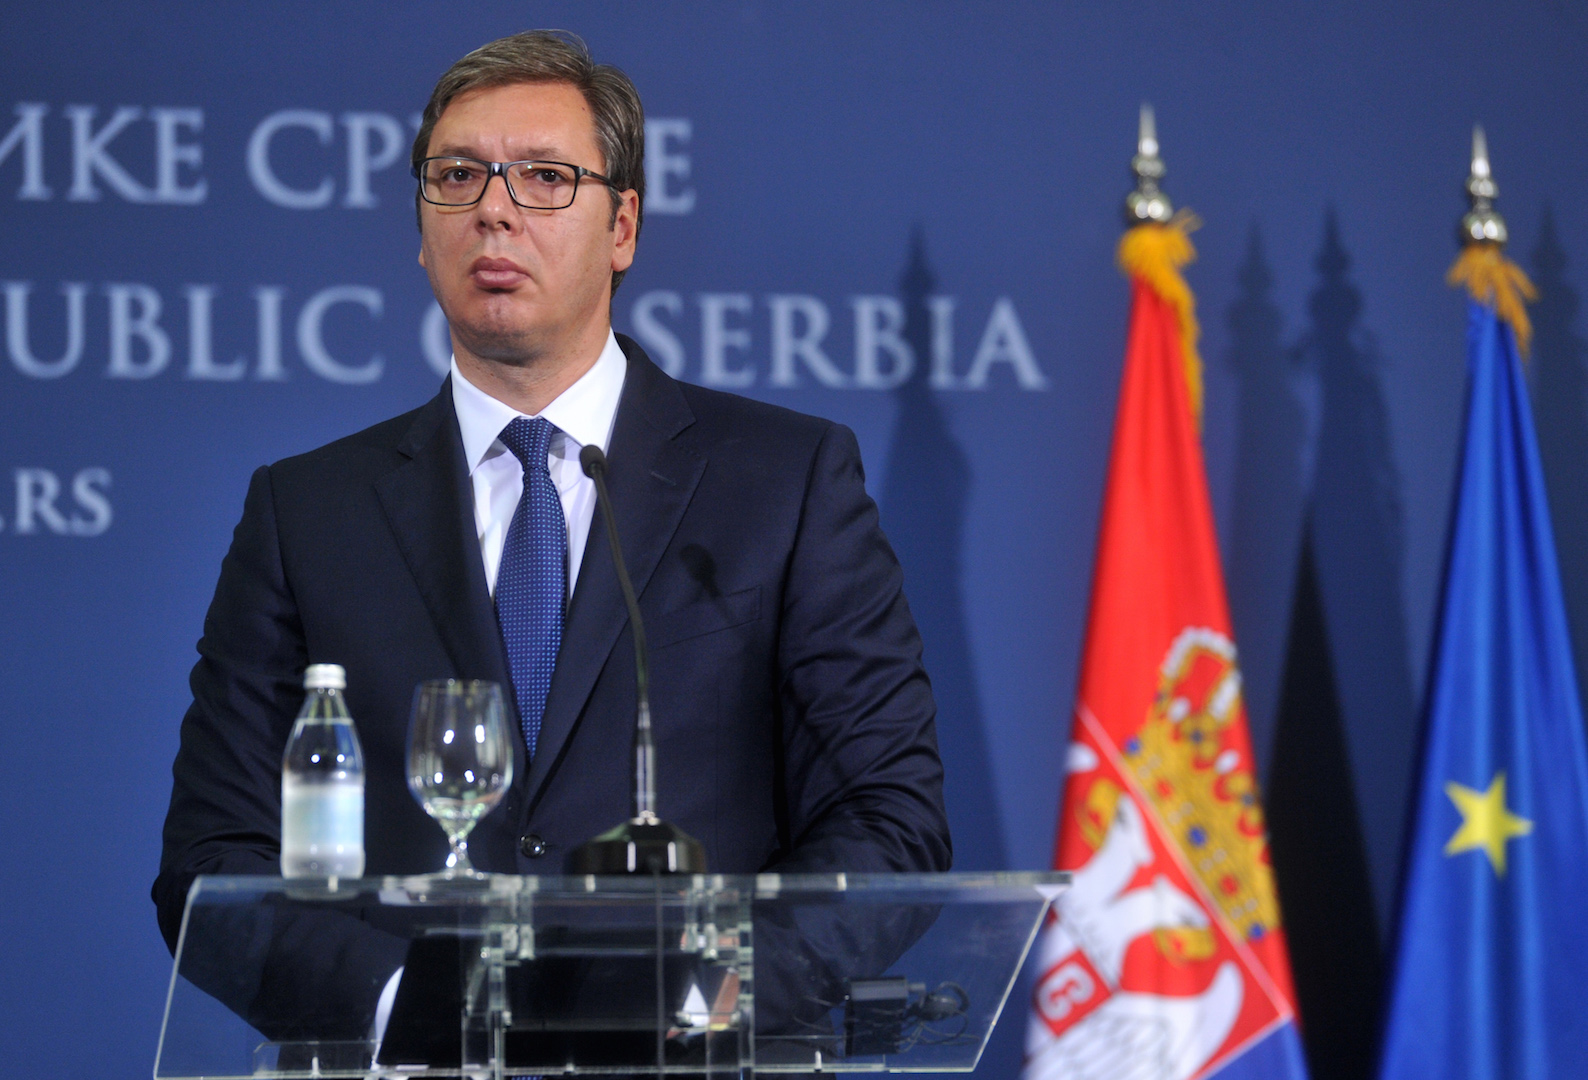 Predsednik Srbije kaže da bi odlaganje razgovora o Kosovu moglo destabilizovati region